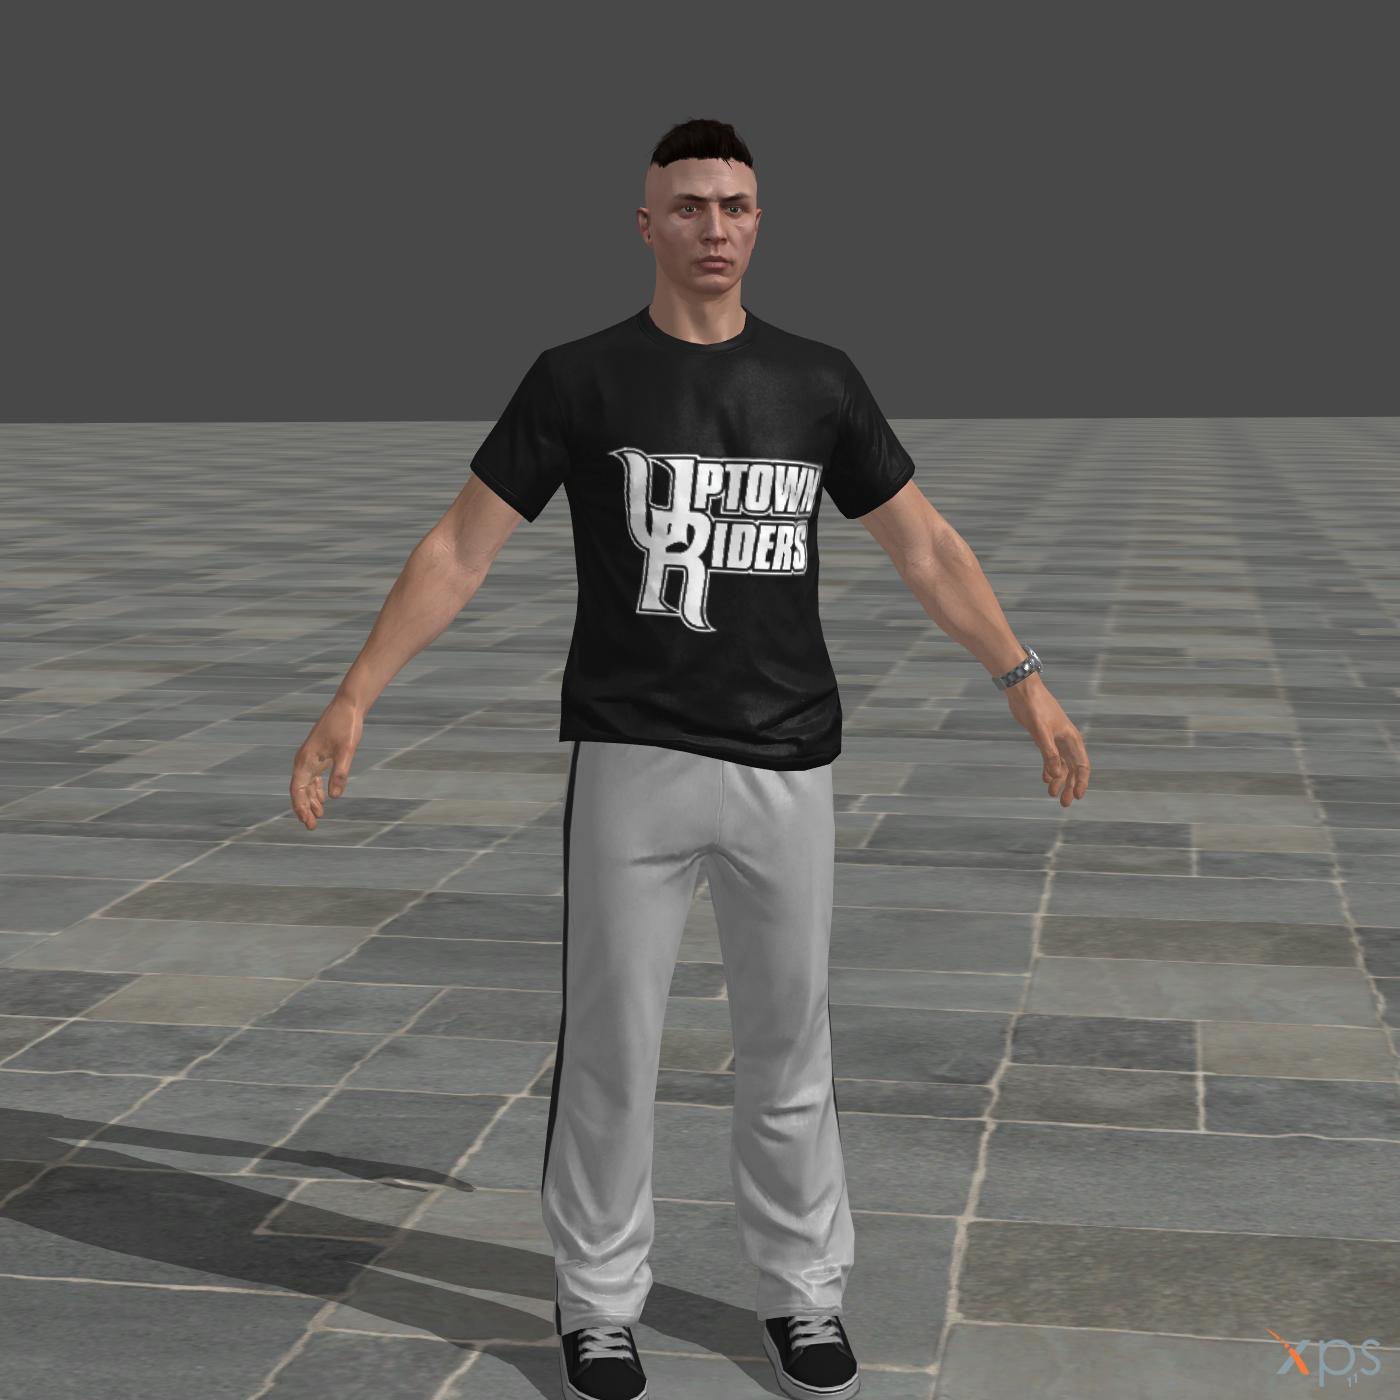 GTAV Online male character for XNAlara/XPS by ParametricEQ on DeviantArt